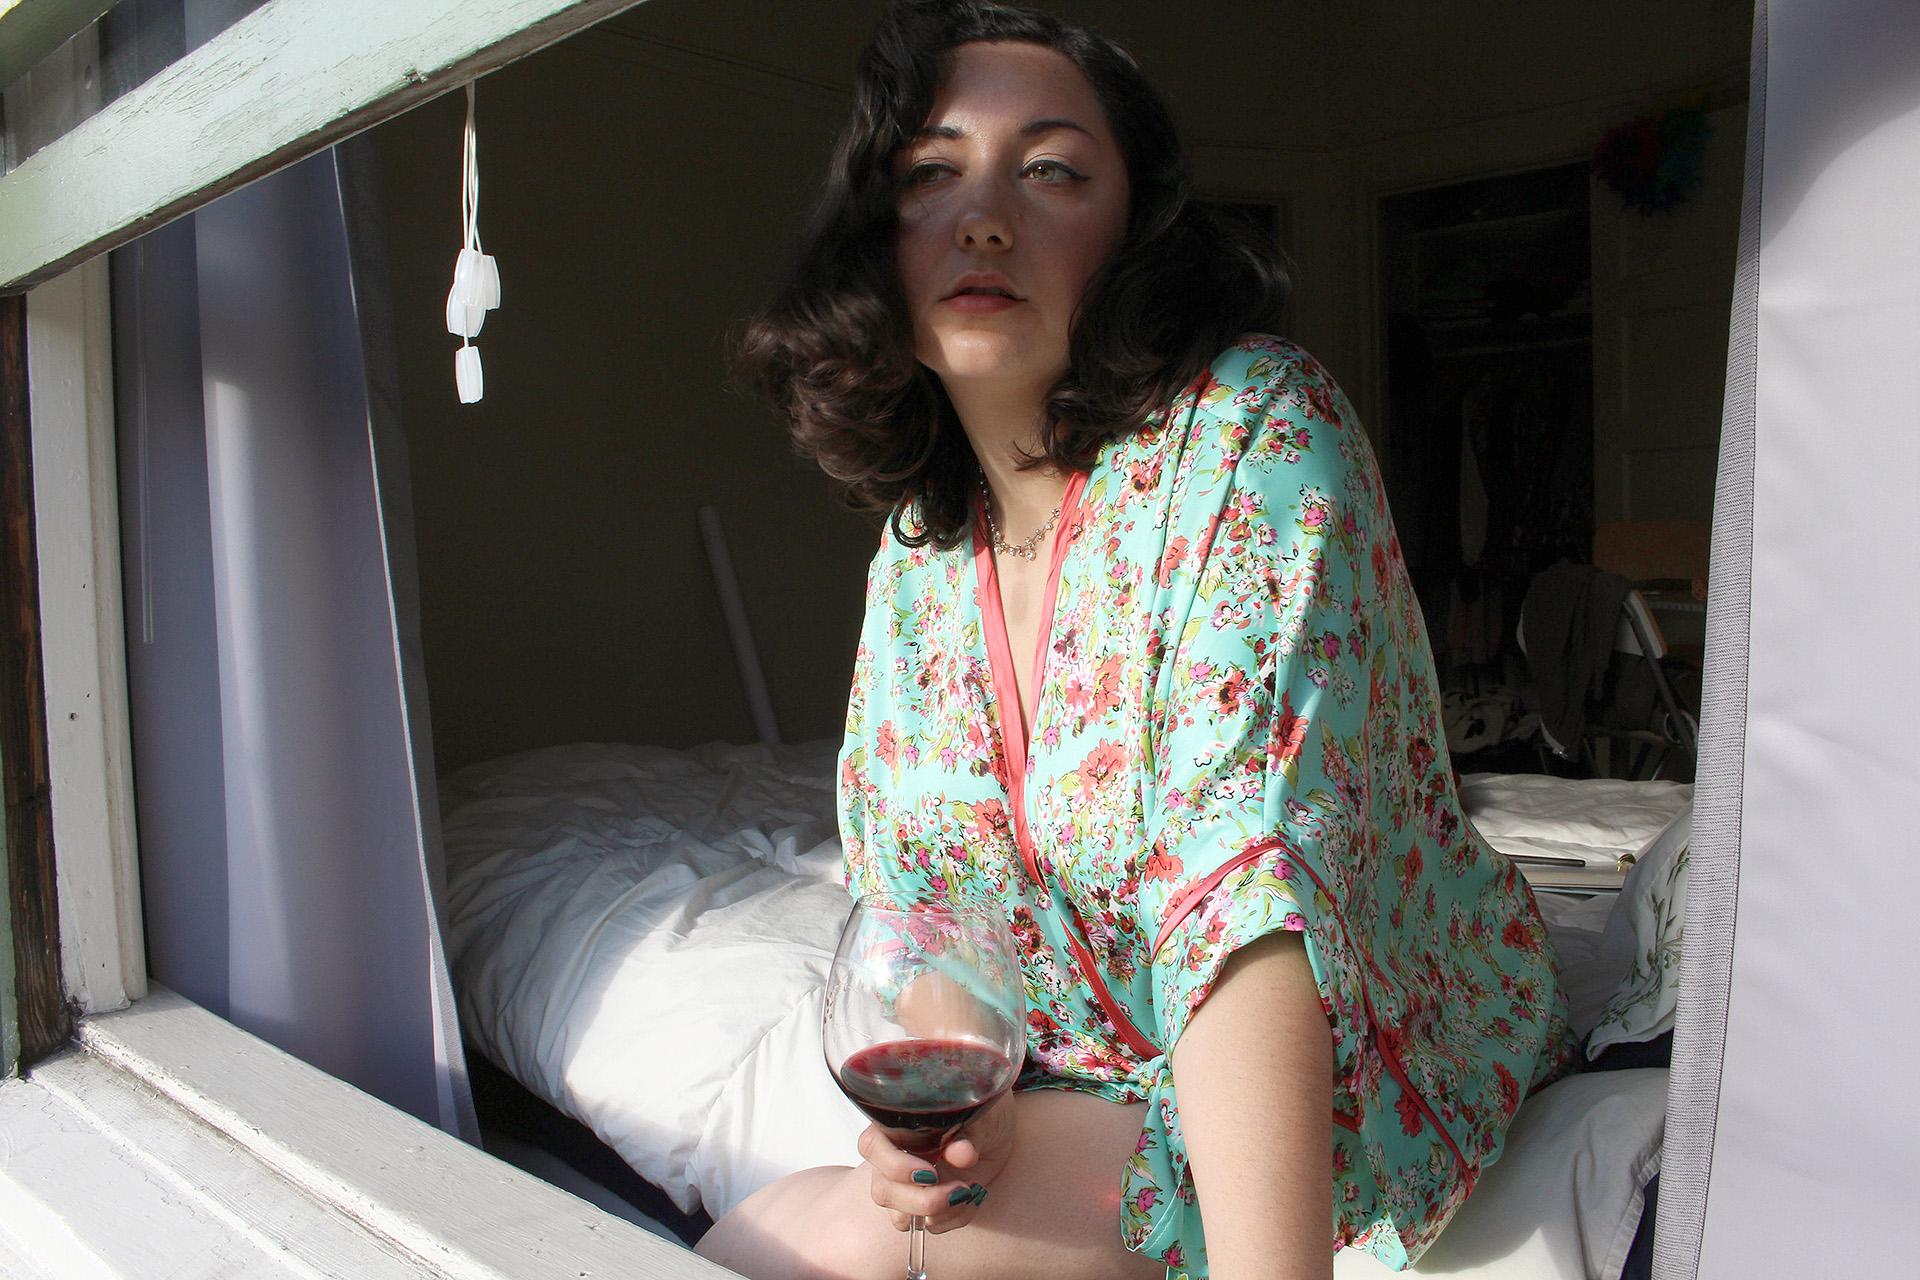 Wine afternoon in my Seamwork Almada Robe | @vintageontap